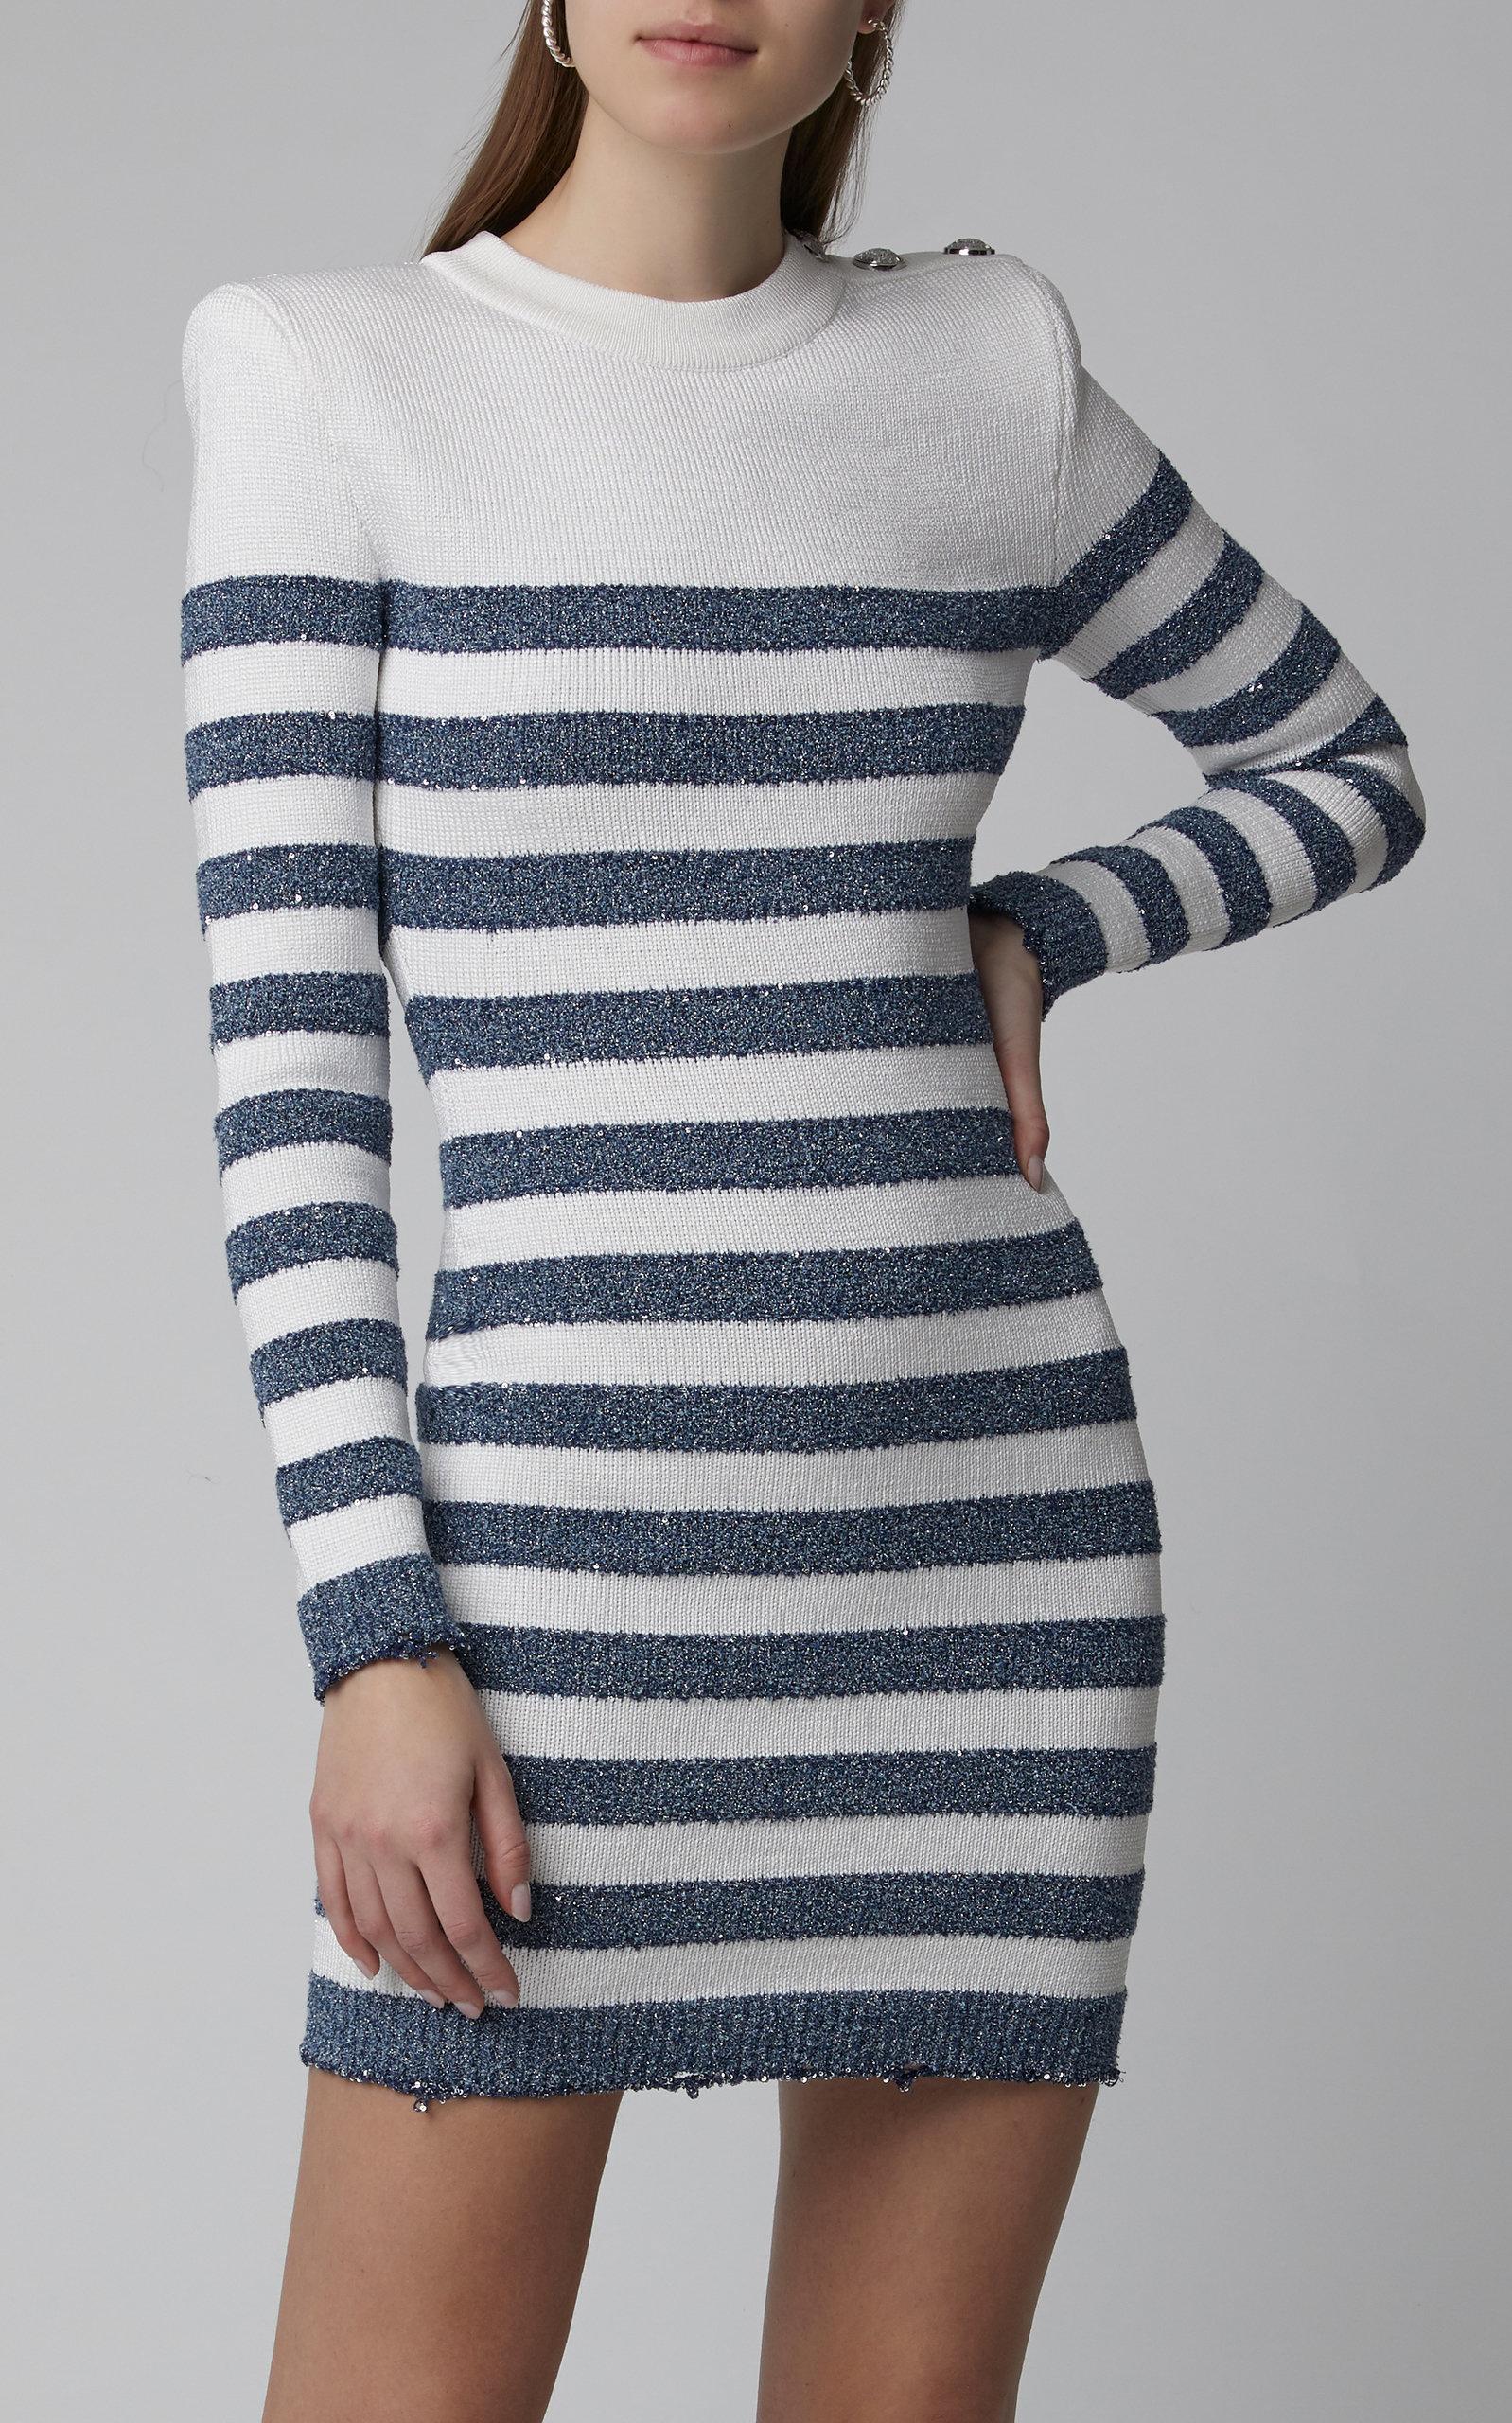 905cd1ba Long-Sleeved Striped Mini Dress by Balmain | Moda Operandi